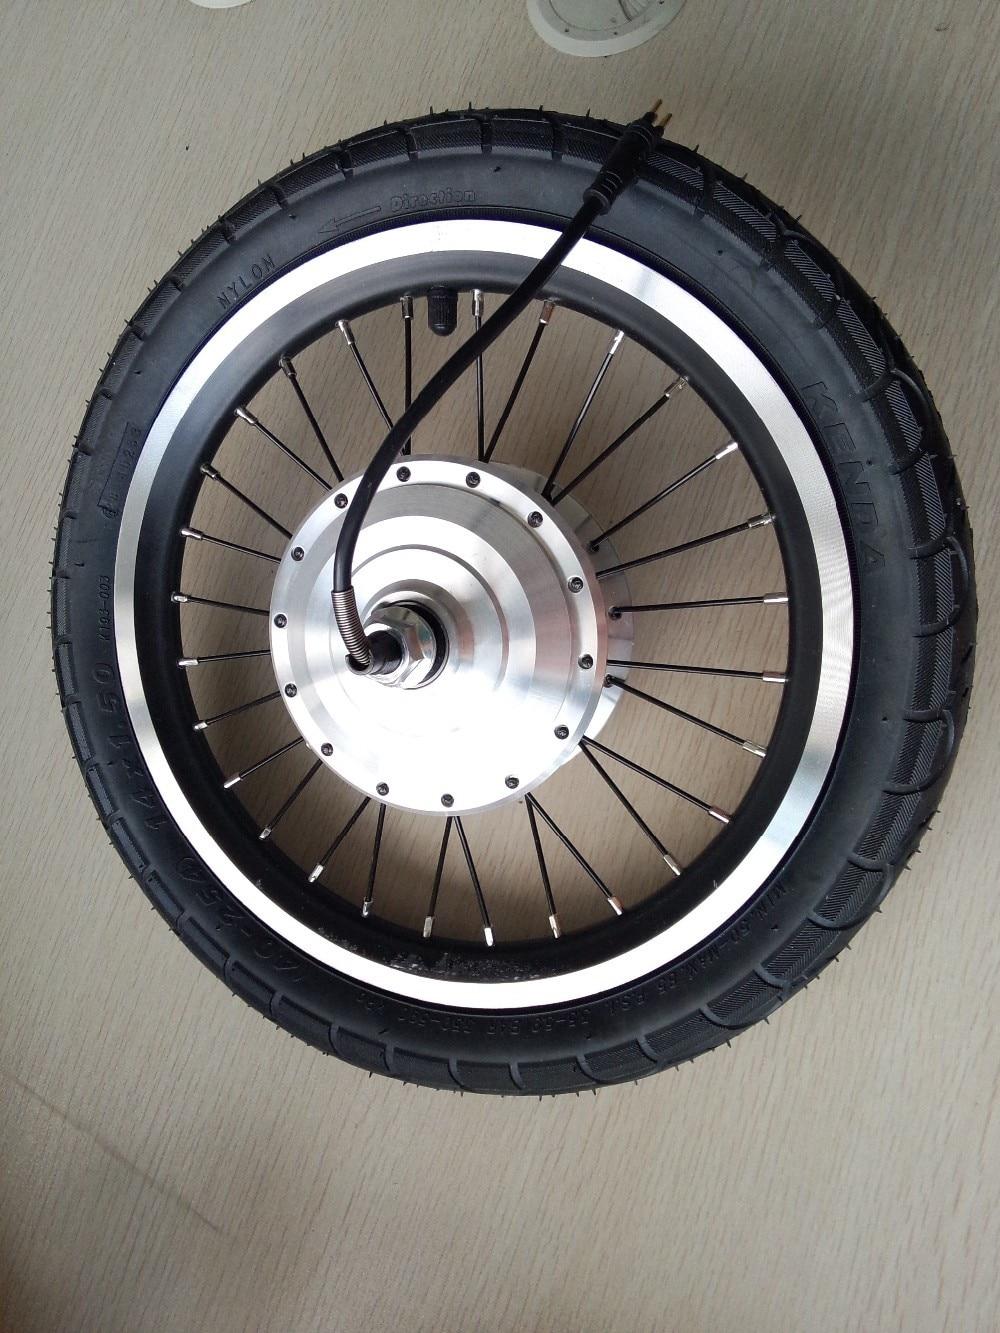 24 В 250 Вт 14 28 H 260 об./мин. переднего колеса мини Серебряный комплект двигателя dia. 118 мм вилка Size80mm 14 комплект двигателя 14 велосипед conversion kit